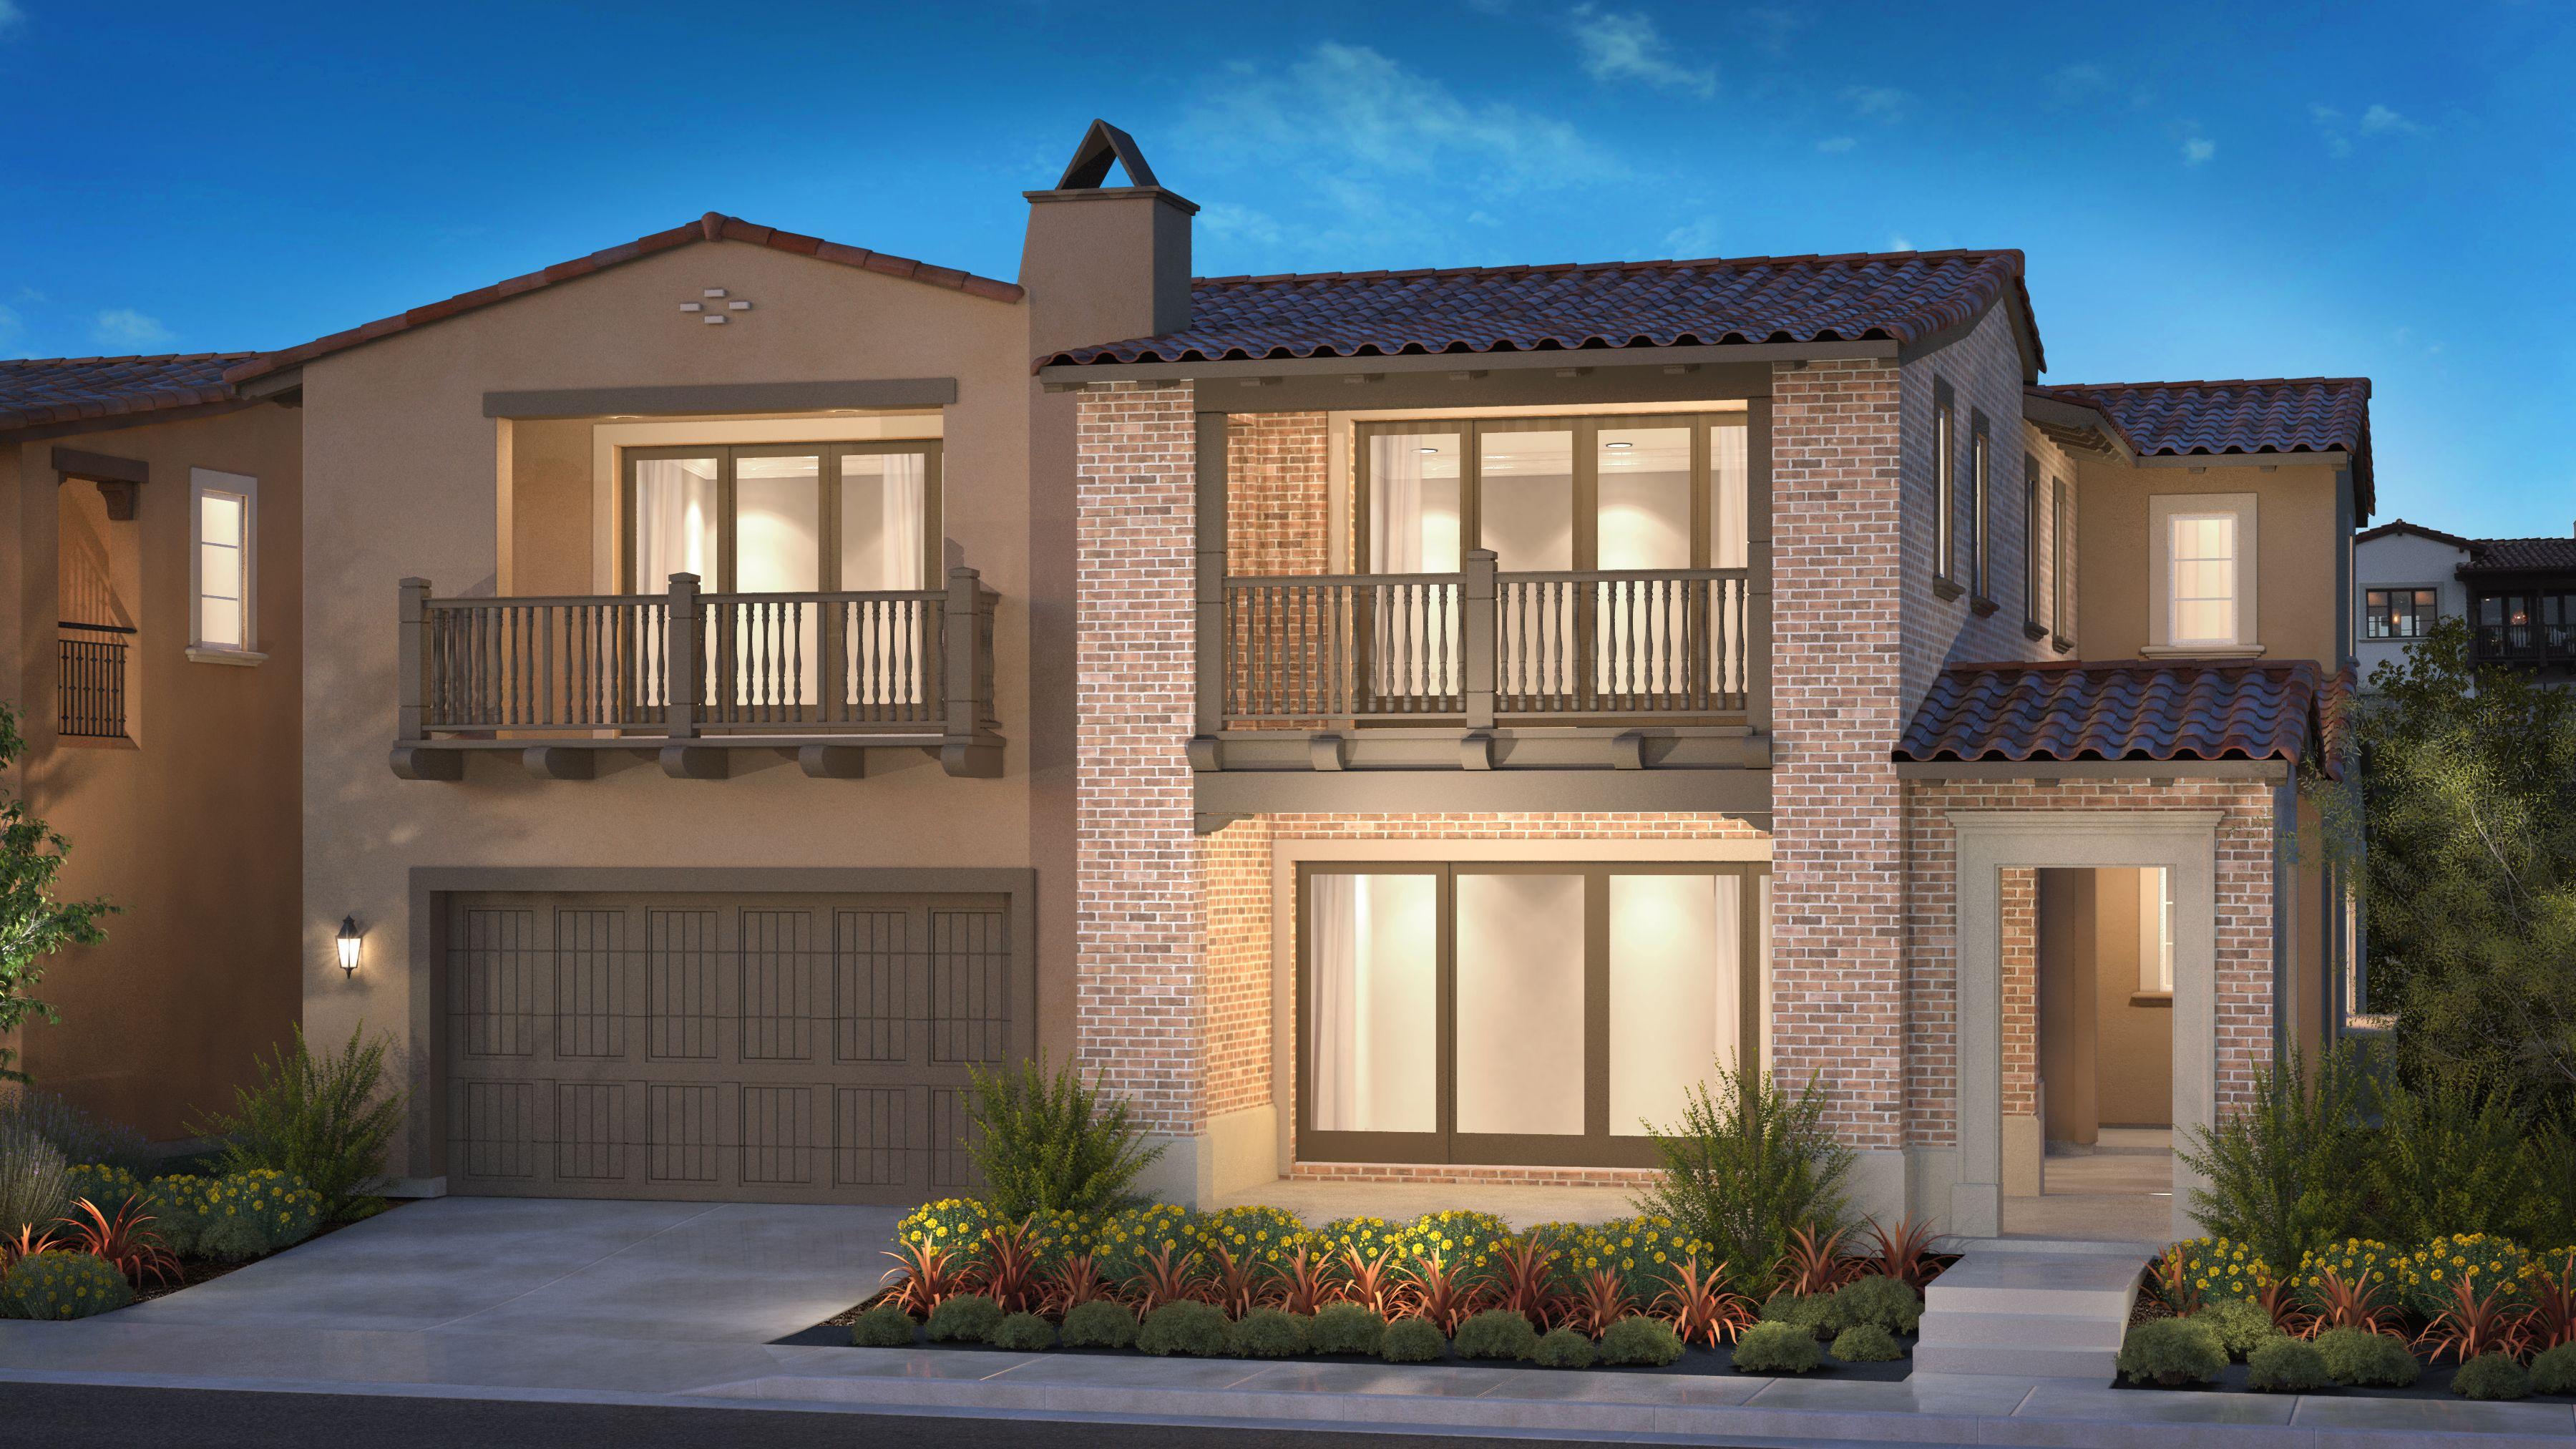 Taylor Morrison Orange County CA Communities & Homes for Sale ...